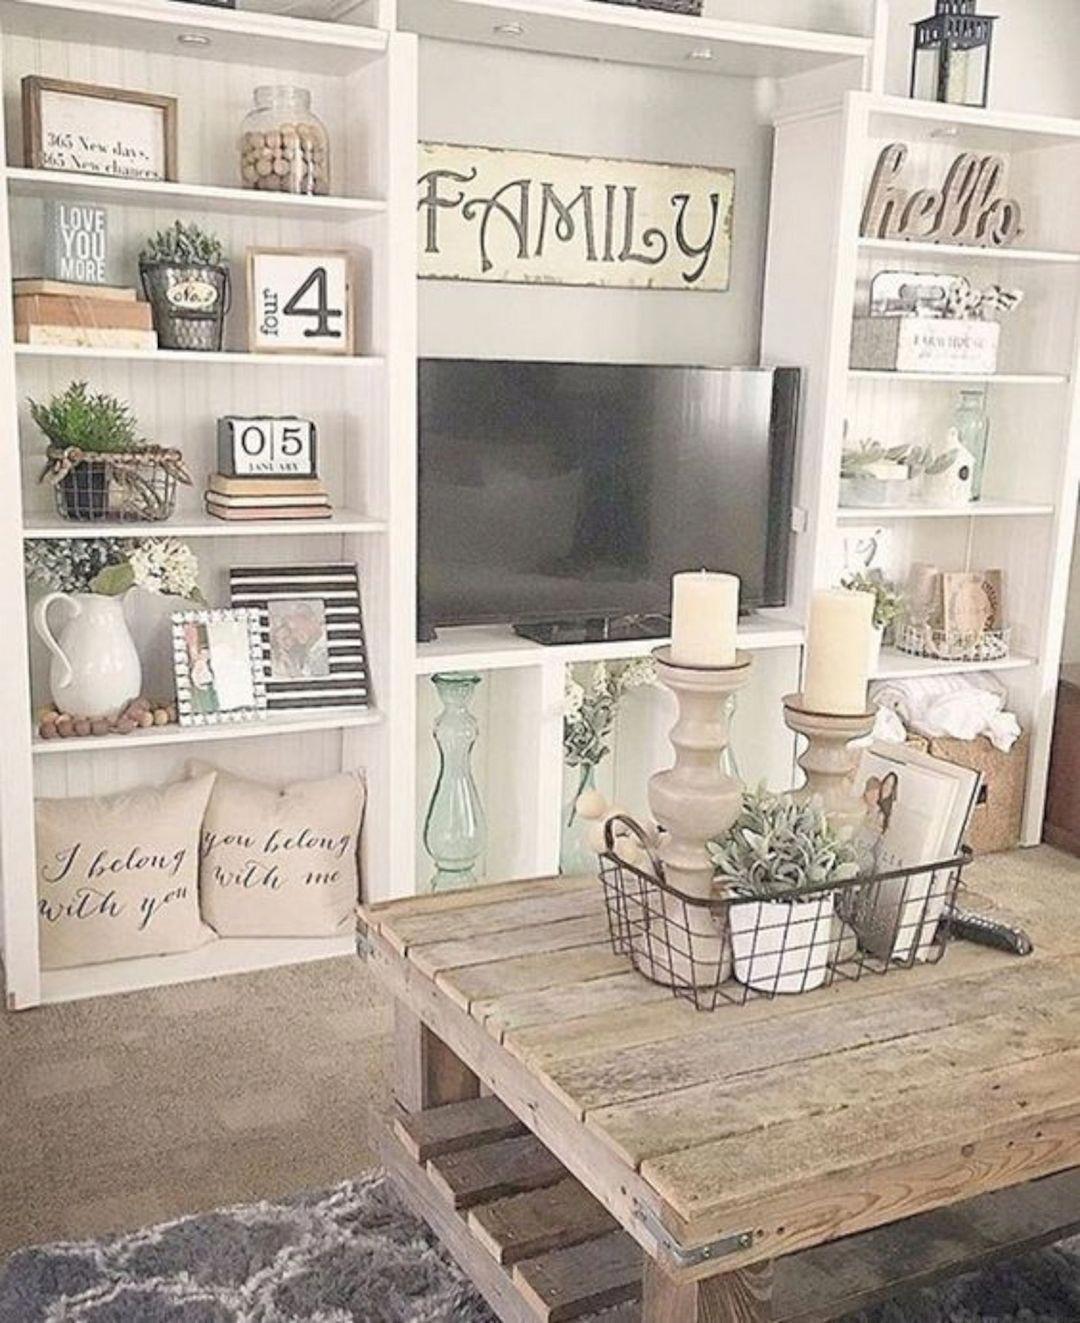 16 Furniture Ideas To Bring Out Farmhouse Flair At Home 3